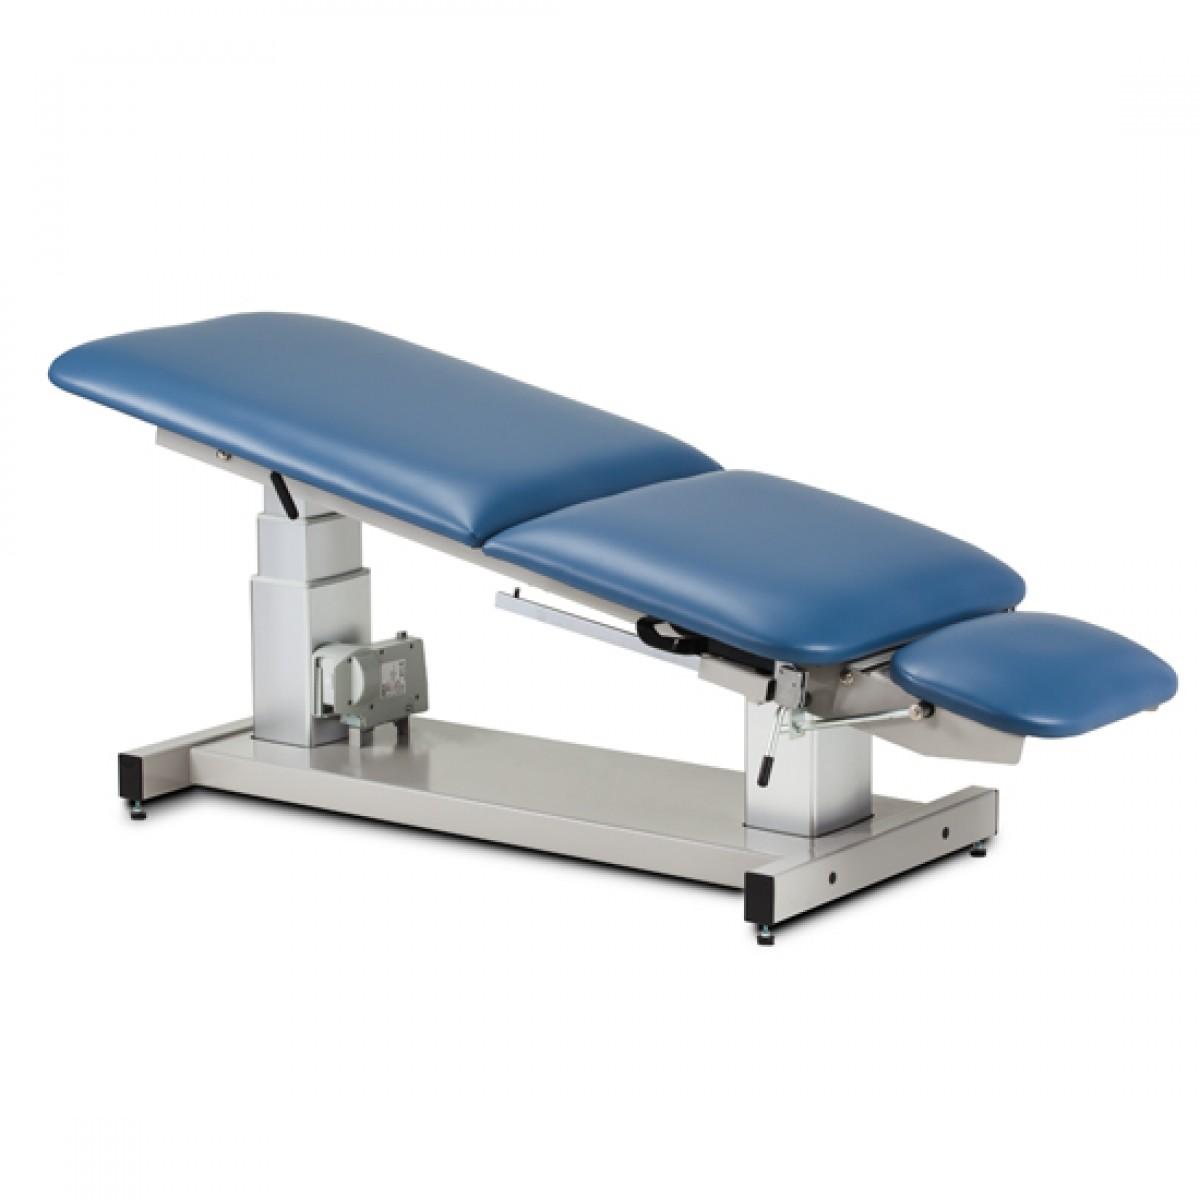 Clinton 80069 Power Ultrasound Table